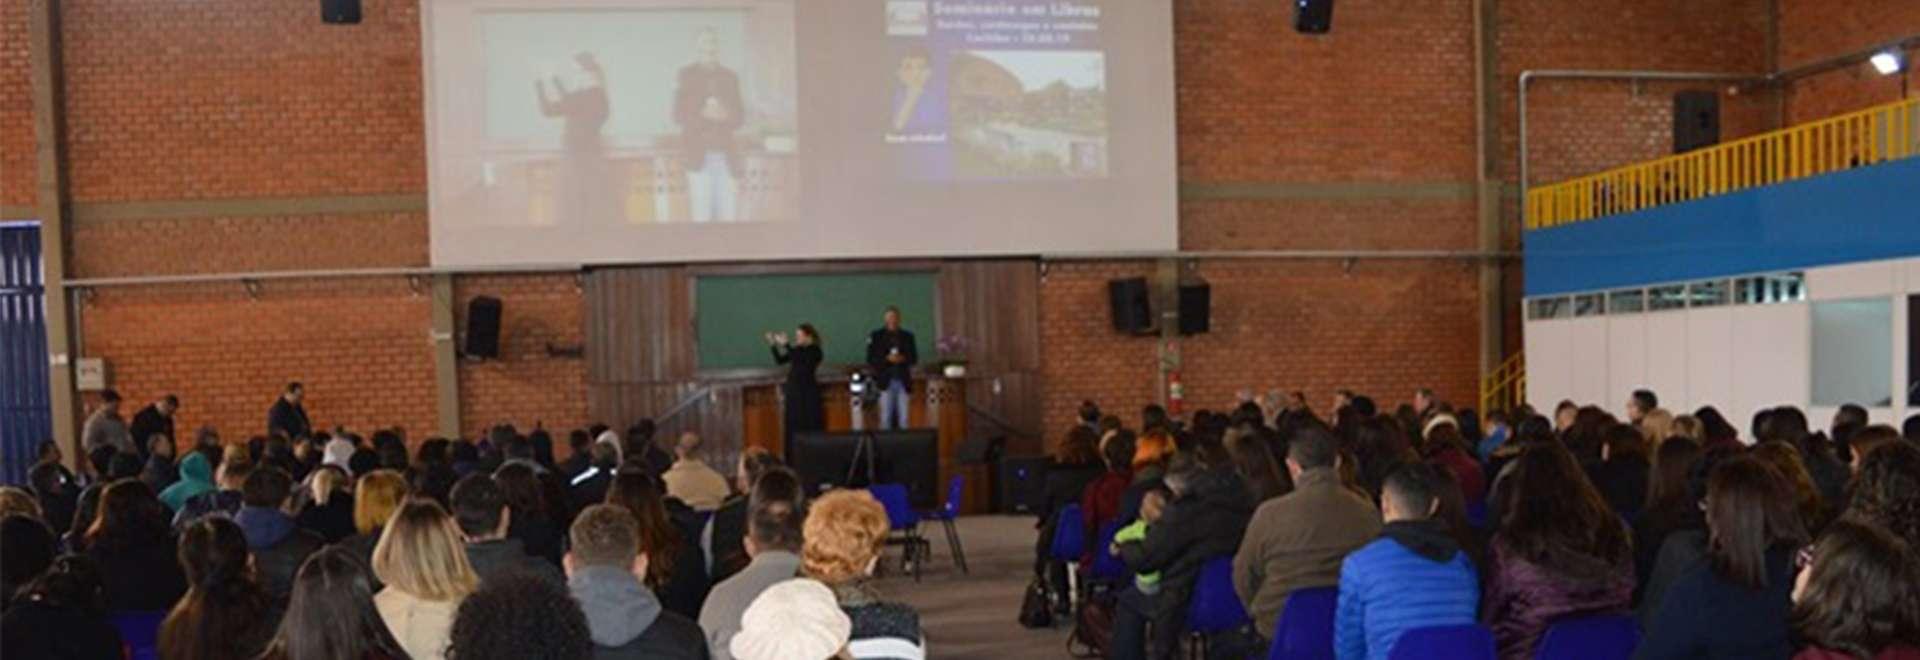 Surdos e surdocegos participam de seminário no Maanaim de Curitiba, PR